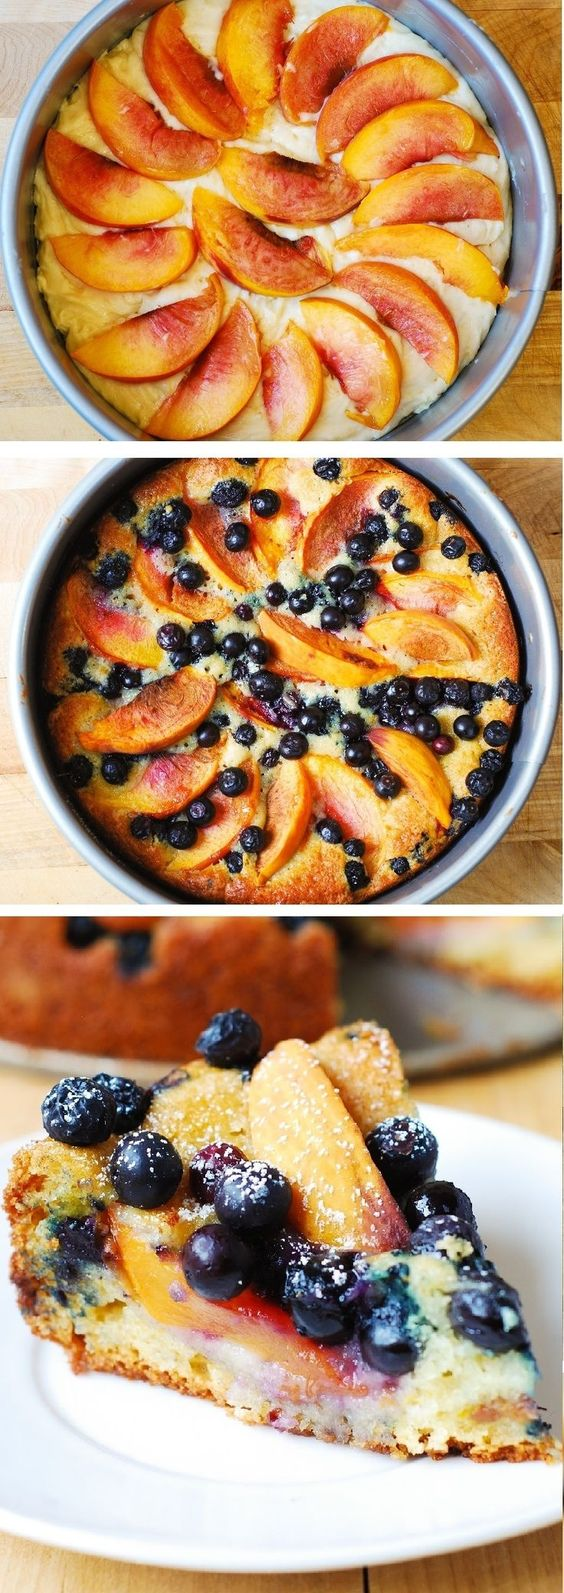 Peach And Blueberry Greek Yogurt